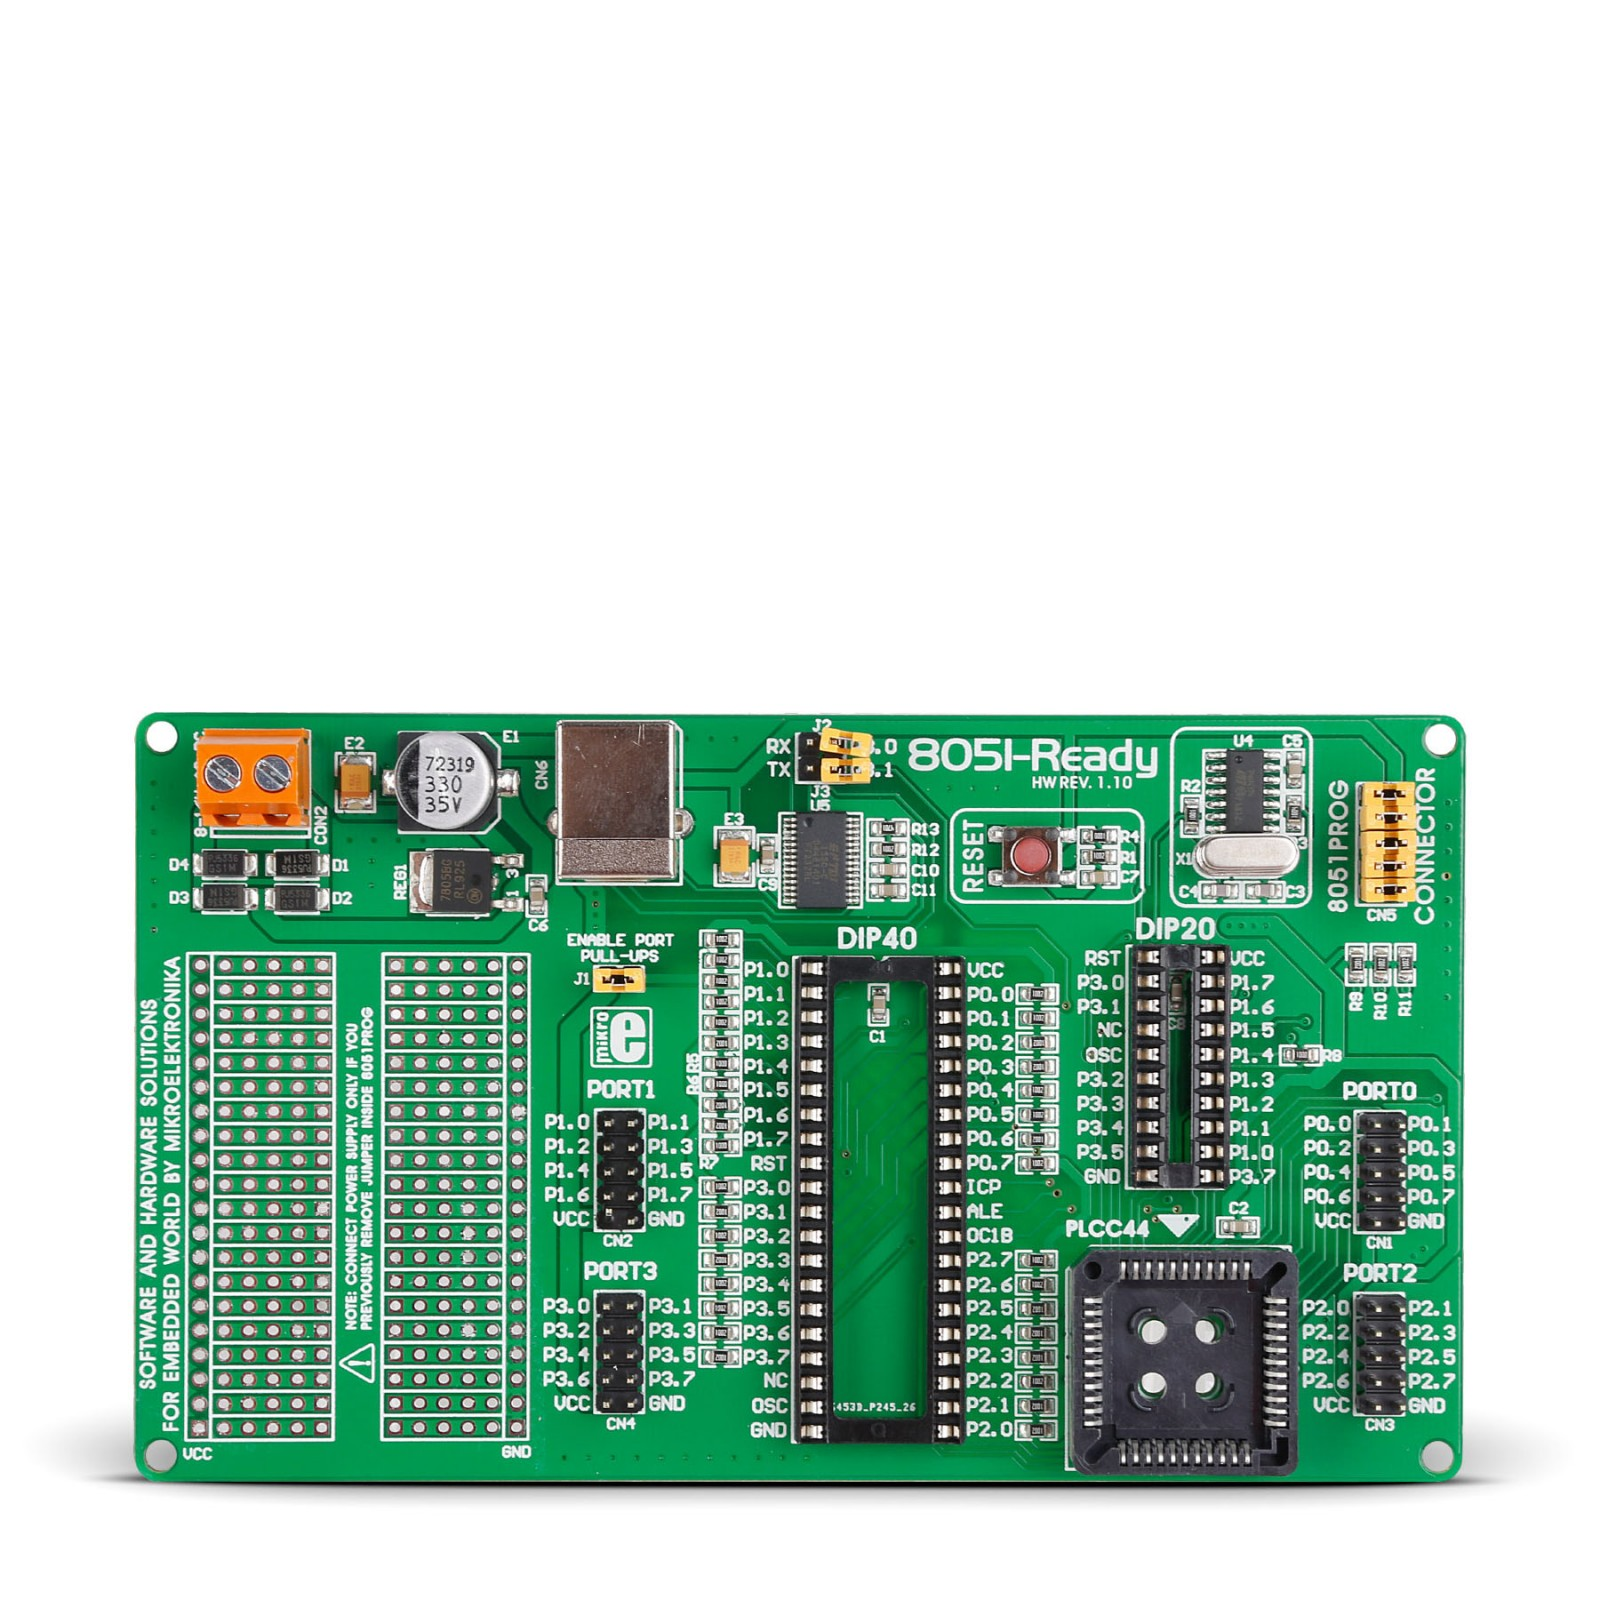 8051 Ready Board 20 40 And 44 Pin Atmel Microcontroller Rfid Based Access Control System Using Electronic Circuits Mgctlbxnmzp Mgctlbxv5112 Mgctlbxlc Mgctlbxpprestashop